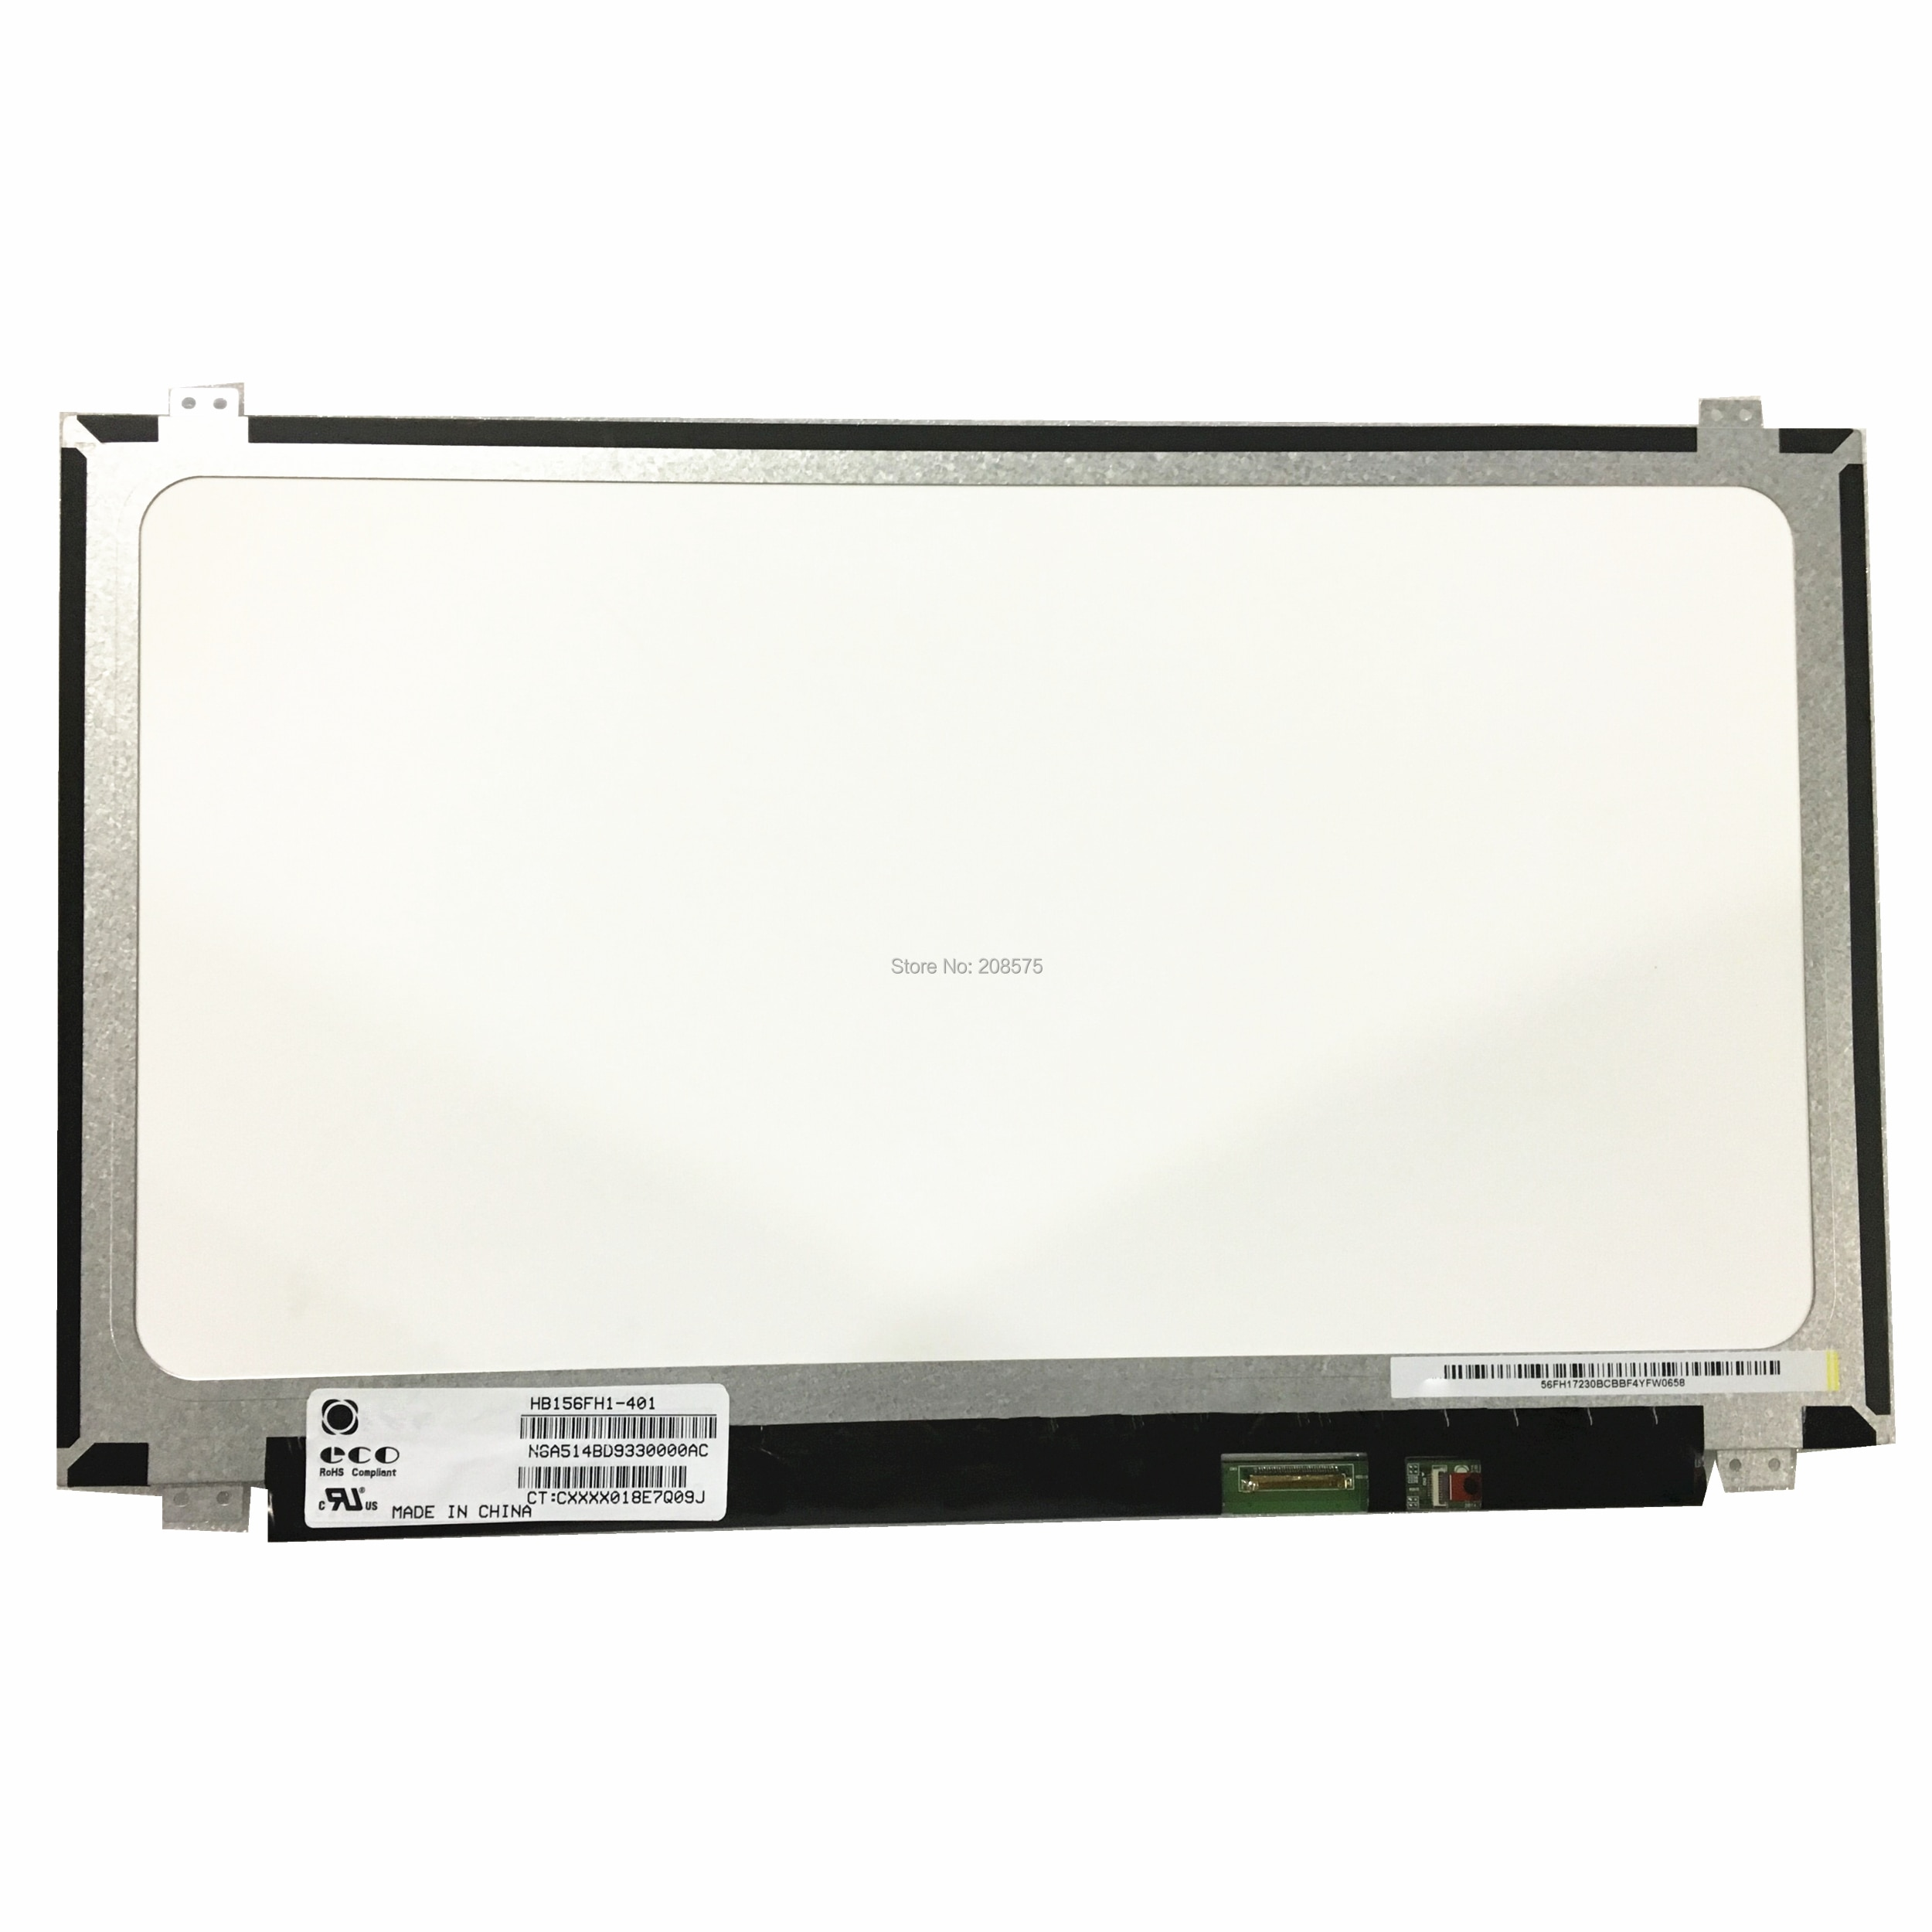 Envío Gratis HB156FH1-401 HB156FH1-301 402 B156HTN03.8 B156HTN03.1 B156HTN03.4 B156HTN03.7 1920*1080 EDP30pin LED PANEL de pantalla